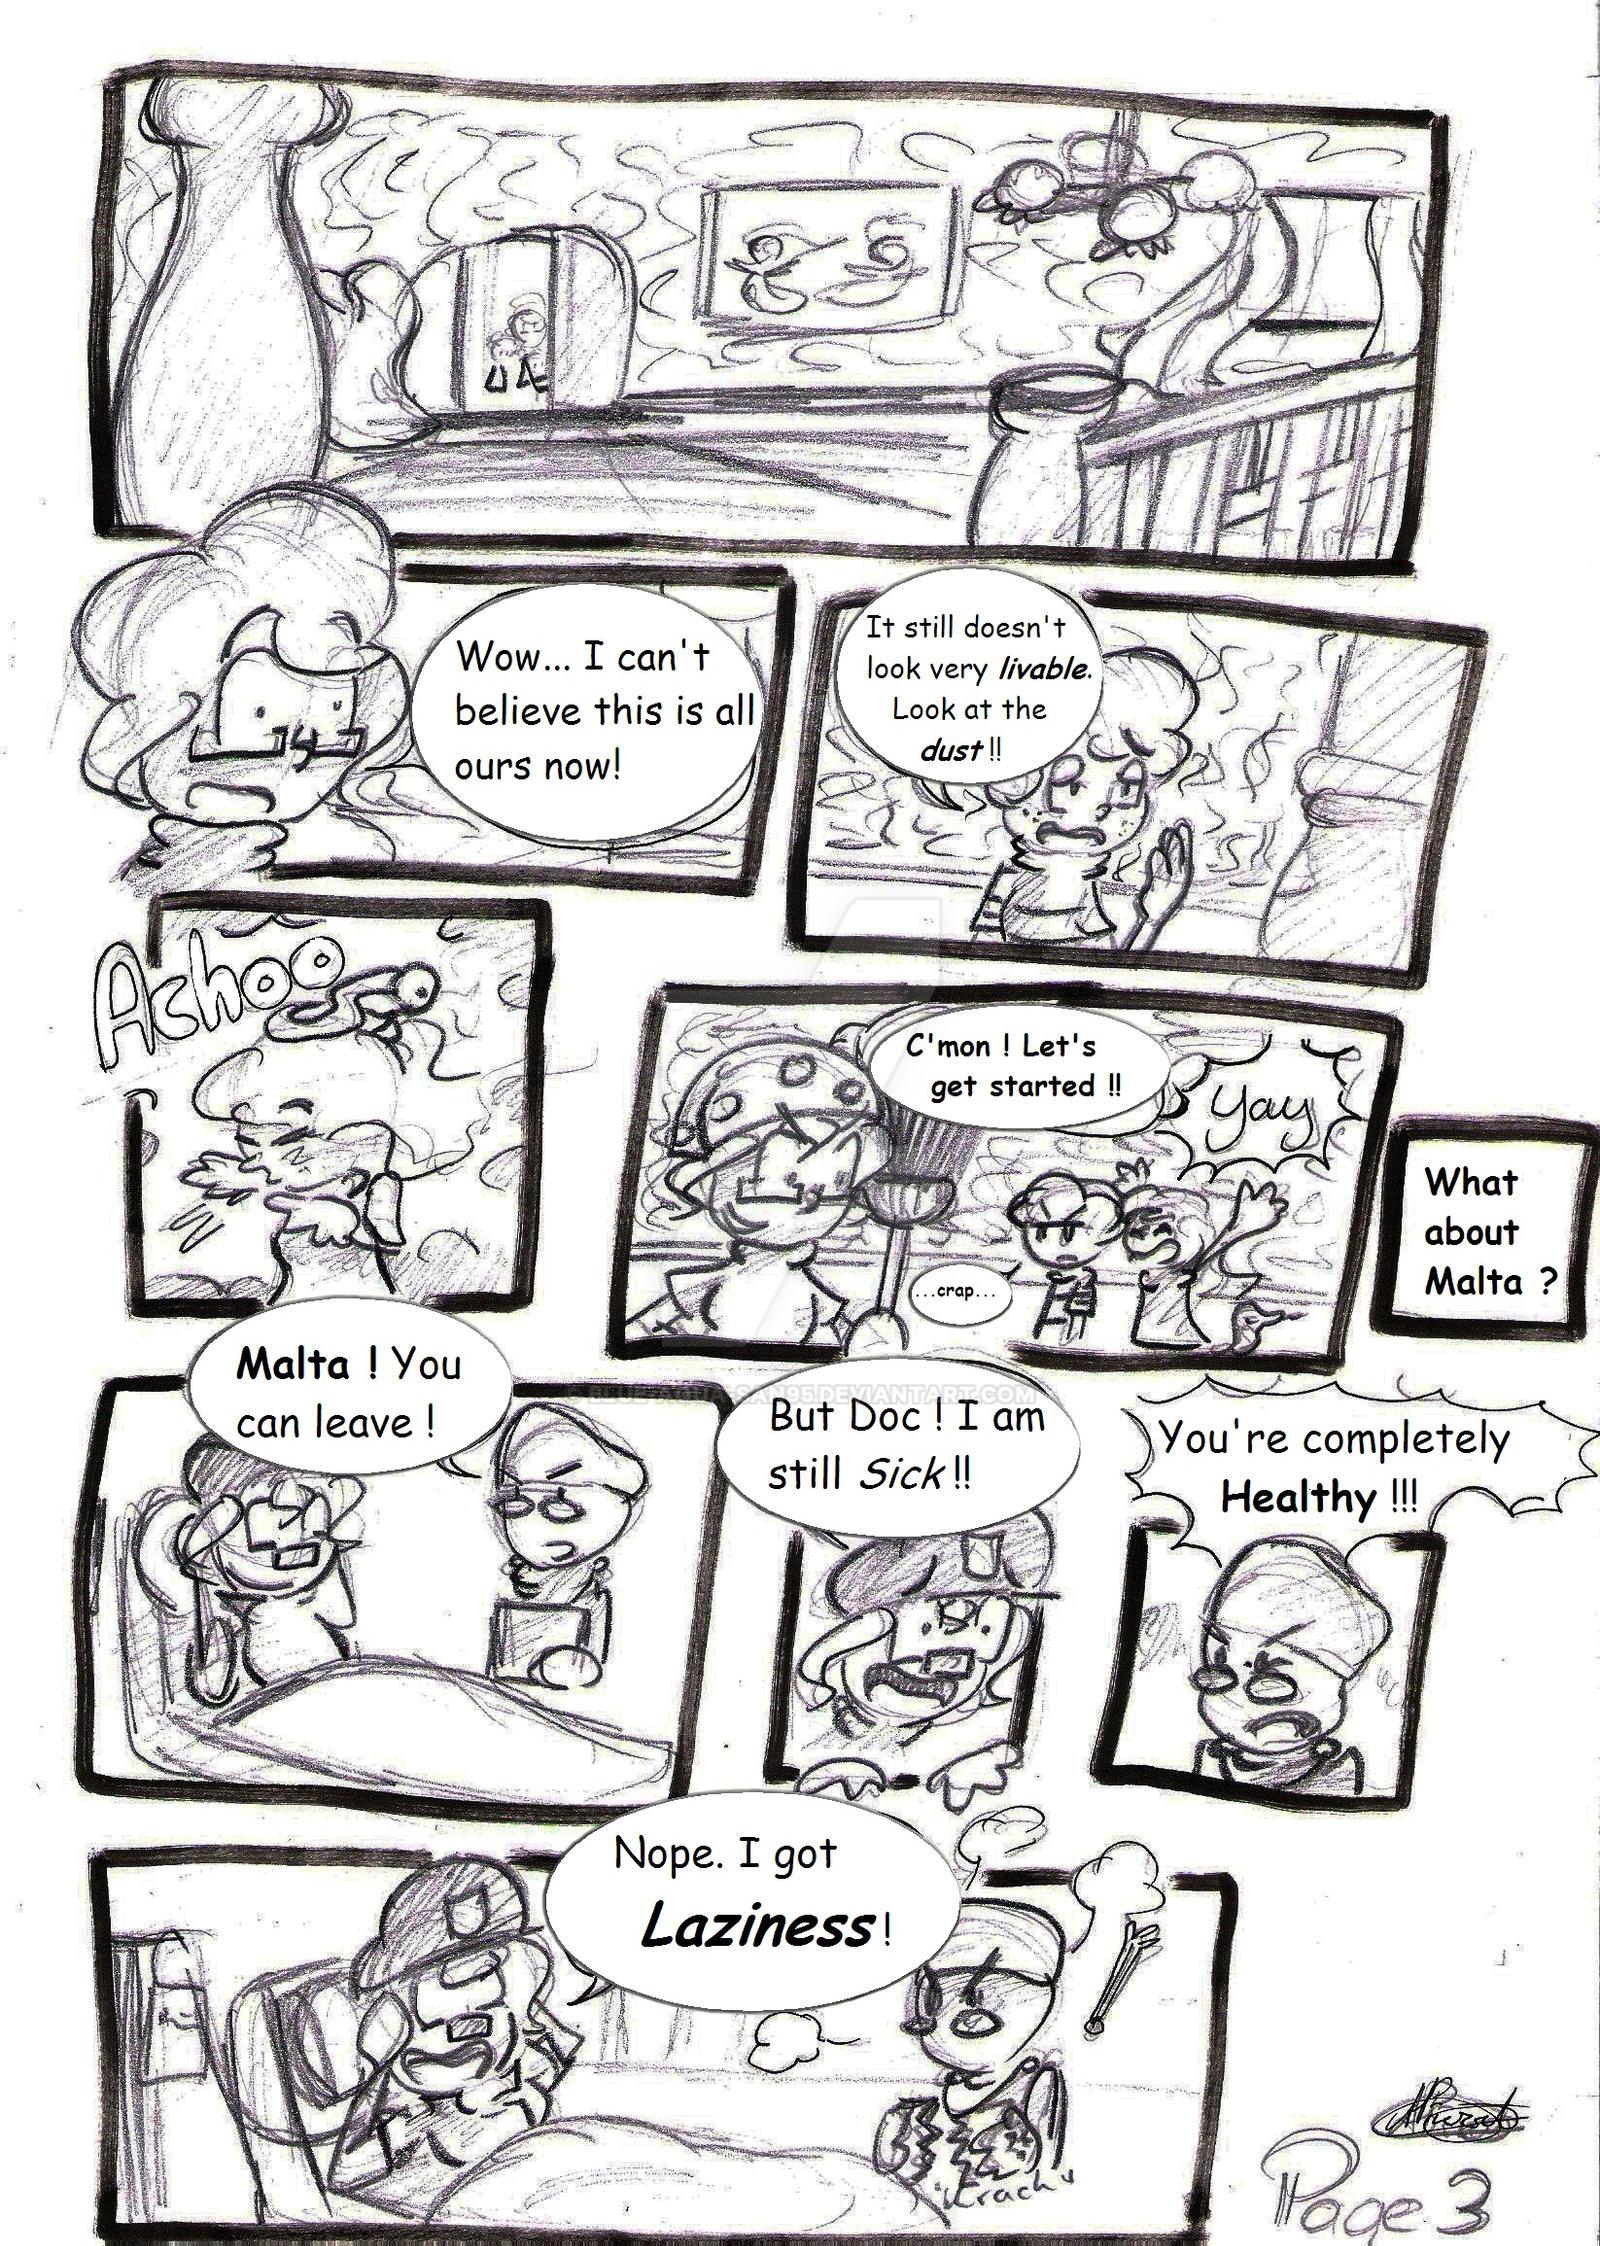 Freak Out - Page 3 by Blue-Aqua-san95